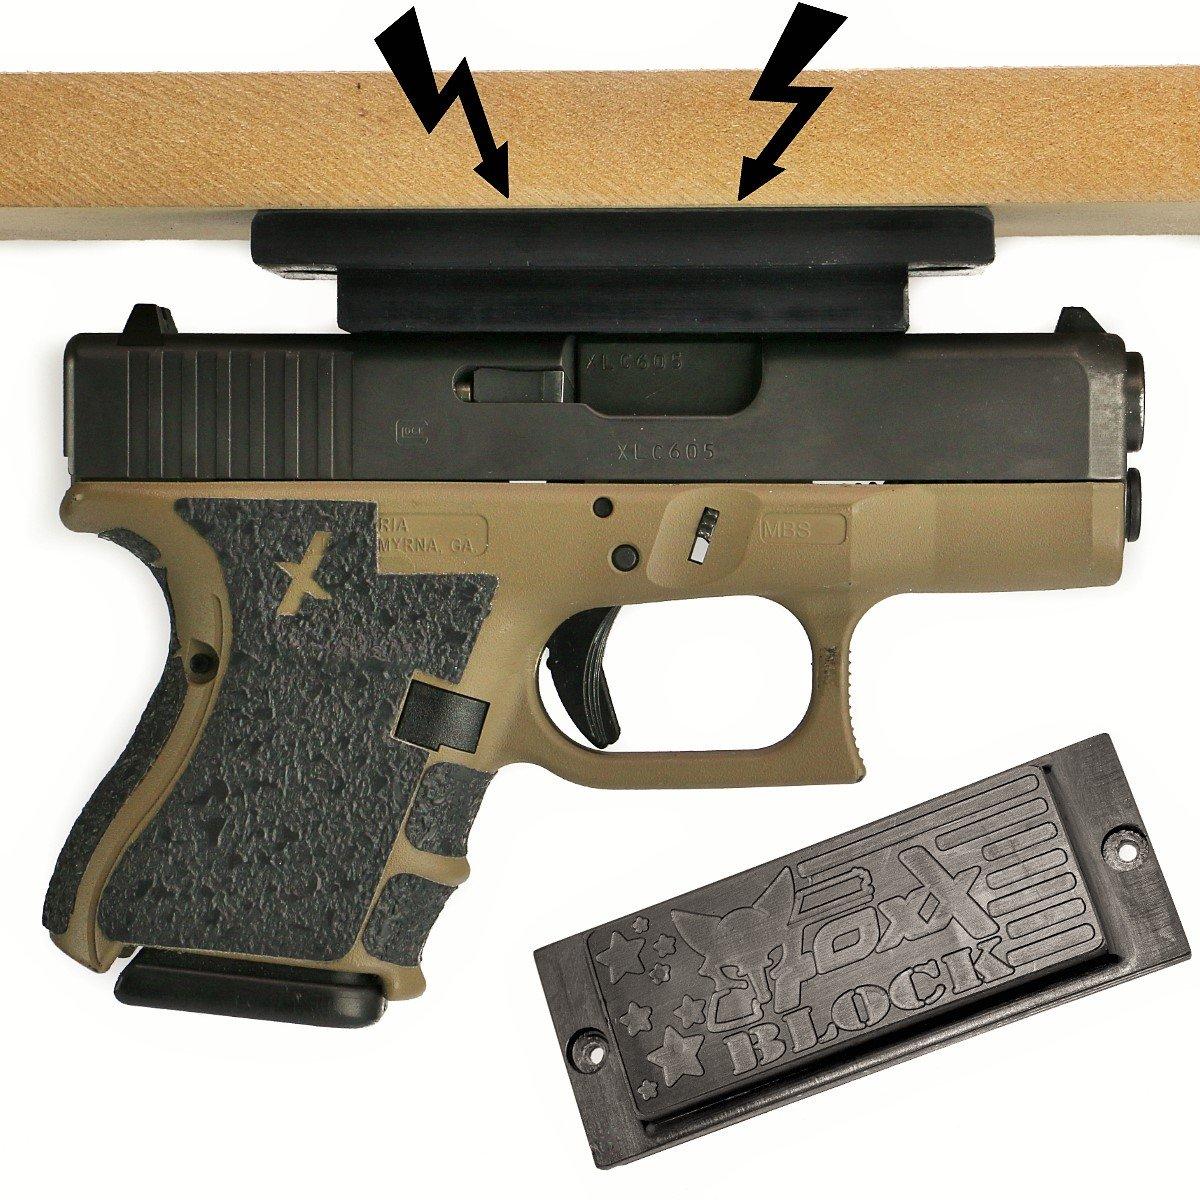 Foxx Block Magnetic Gun Mount Vehicle Home - Gun Magnet Mount Urethane Coated Strongest on Amazon! Concealed Firearm Holder Handgun, Pistol, Revolver, Car, Truck, Desk, Wall Vault FoxX Holsters